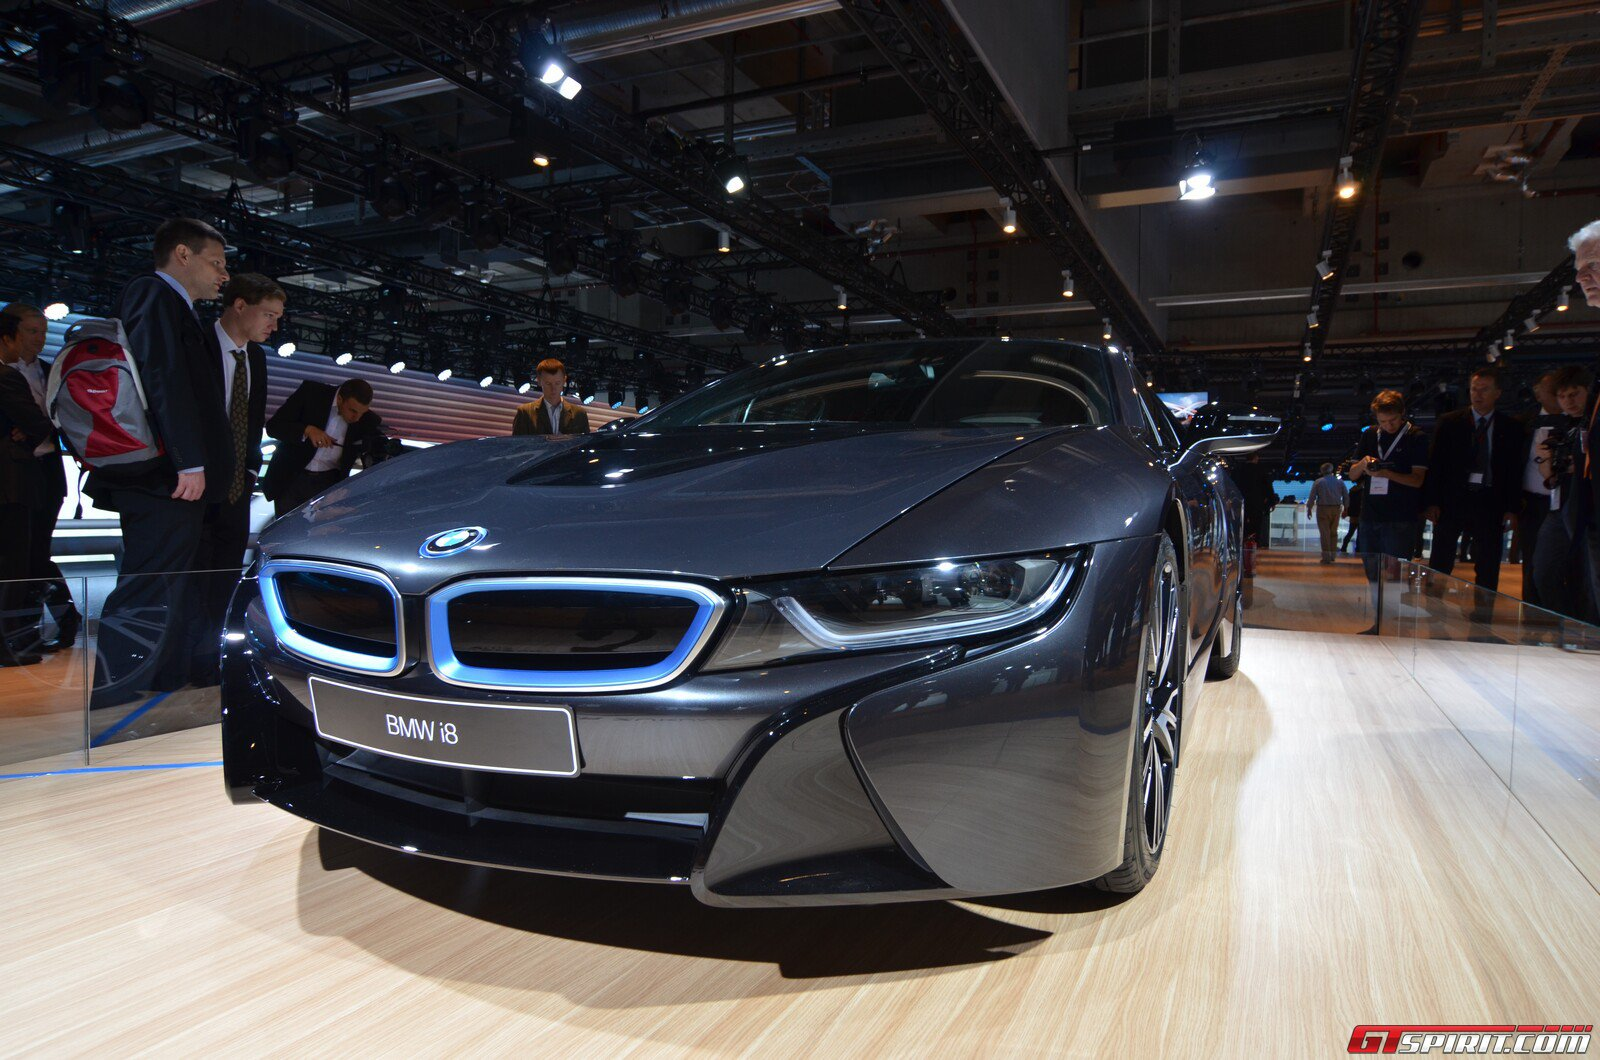 Frankfurt BMW I GTspirit - 2013 bmw i8